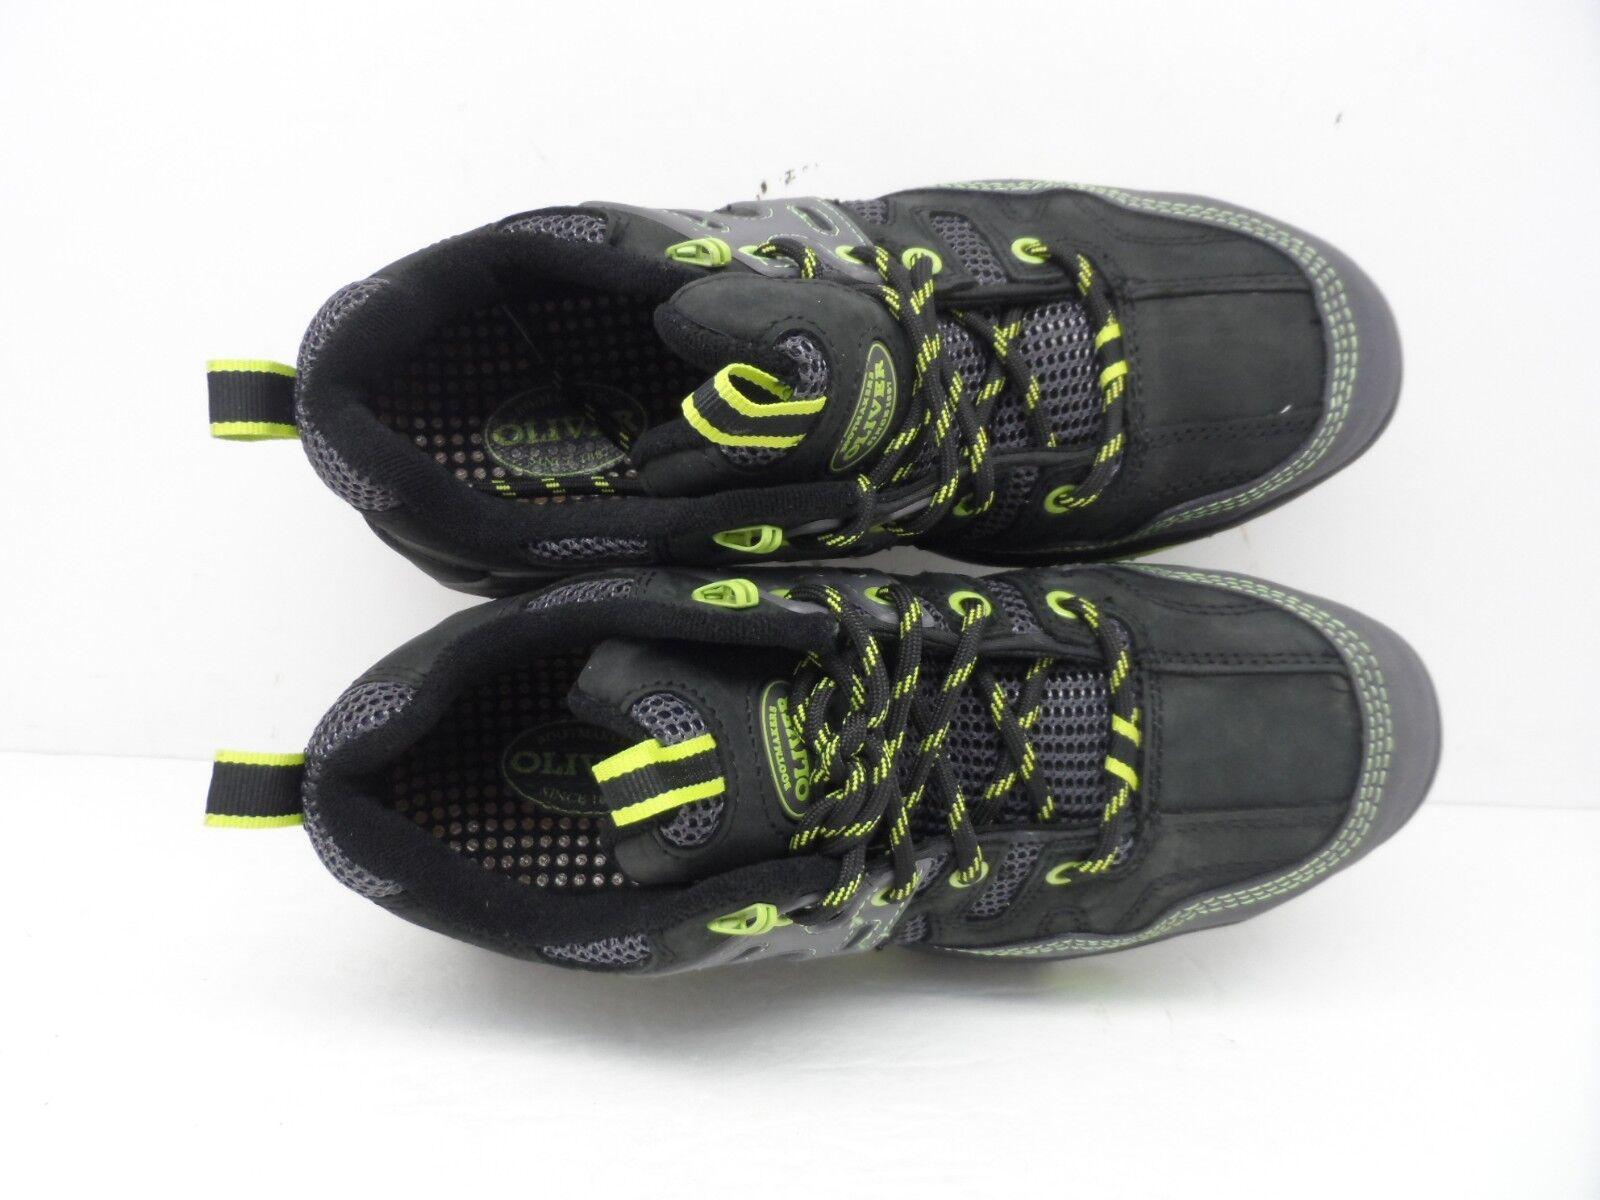 Oliver by Honeywell Para Excursionista Mujer Zapatos Trabajo Para Excursionista Para industrial baja tamaño OL21111 11M 4dd1c3